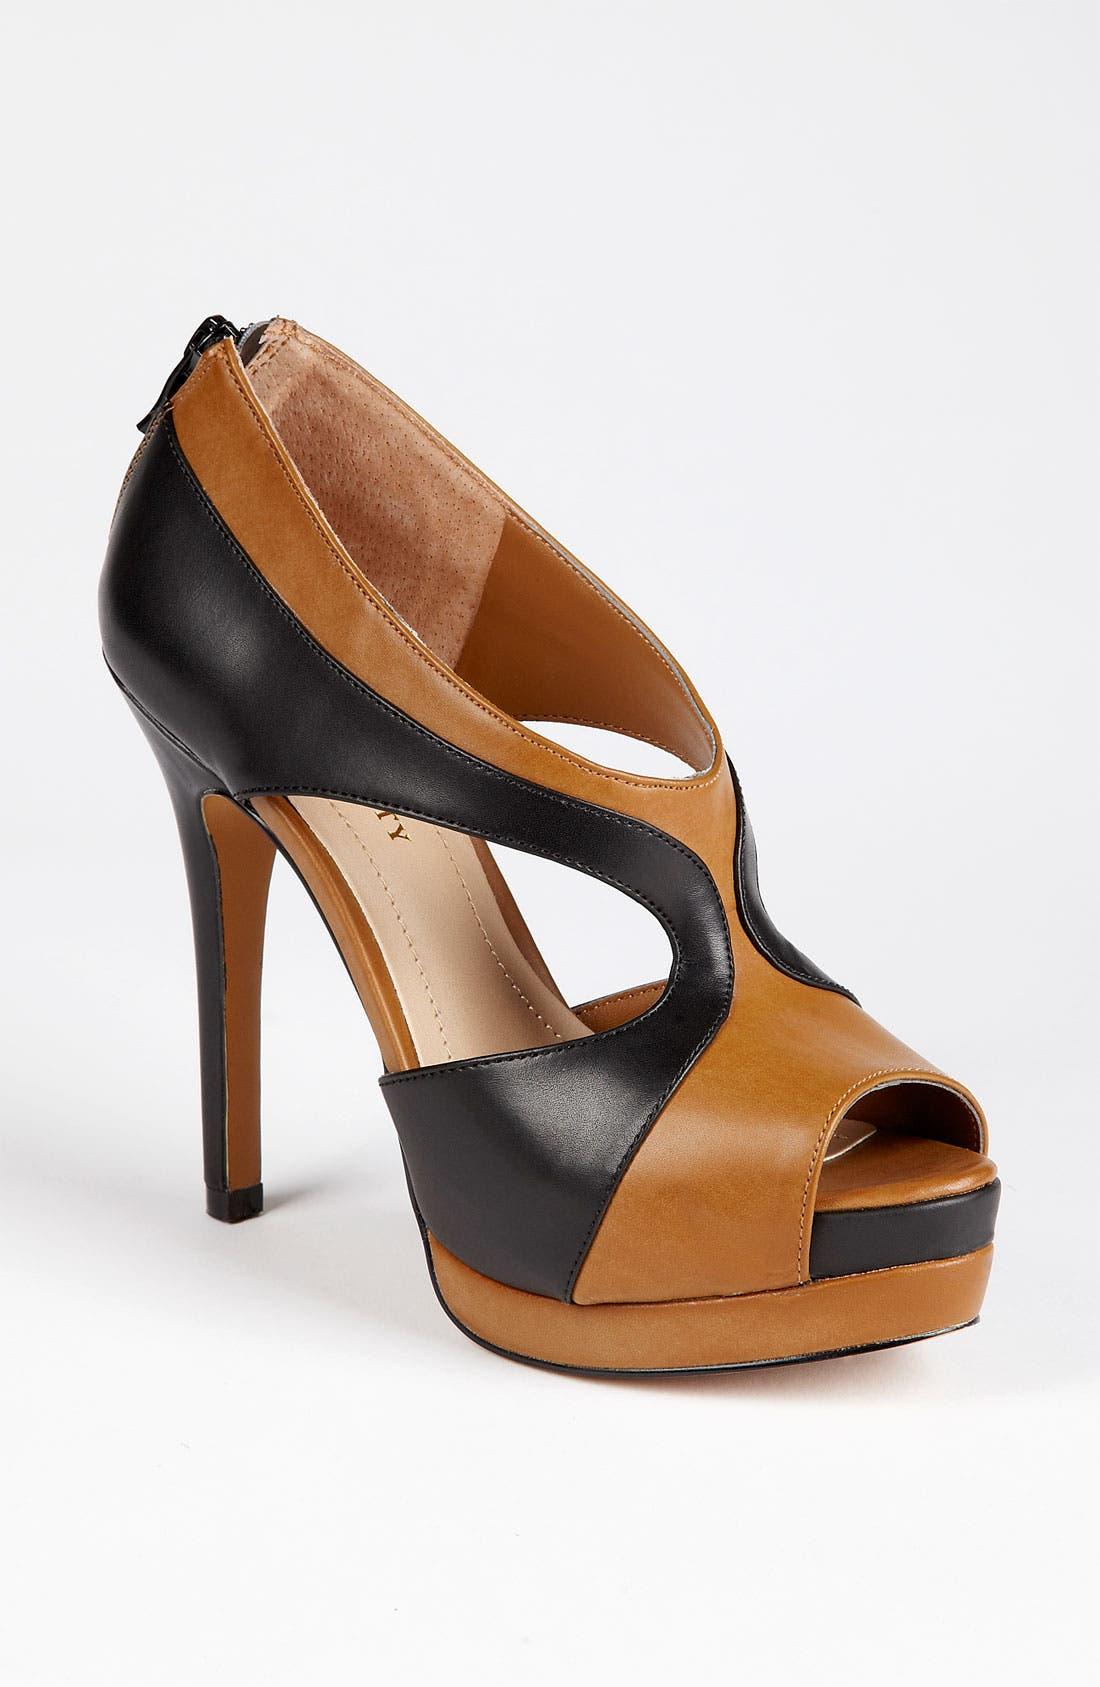 Main Image - Sole Society 'Neve' Platform Sandal